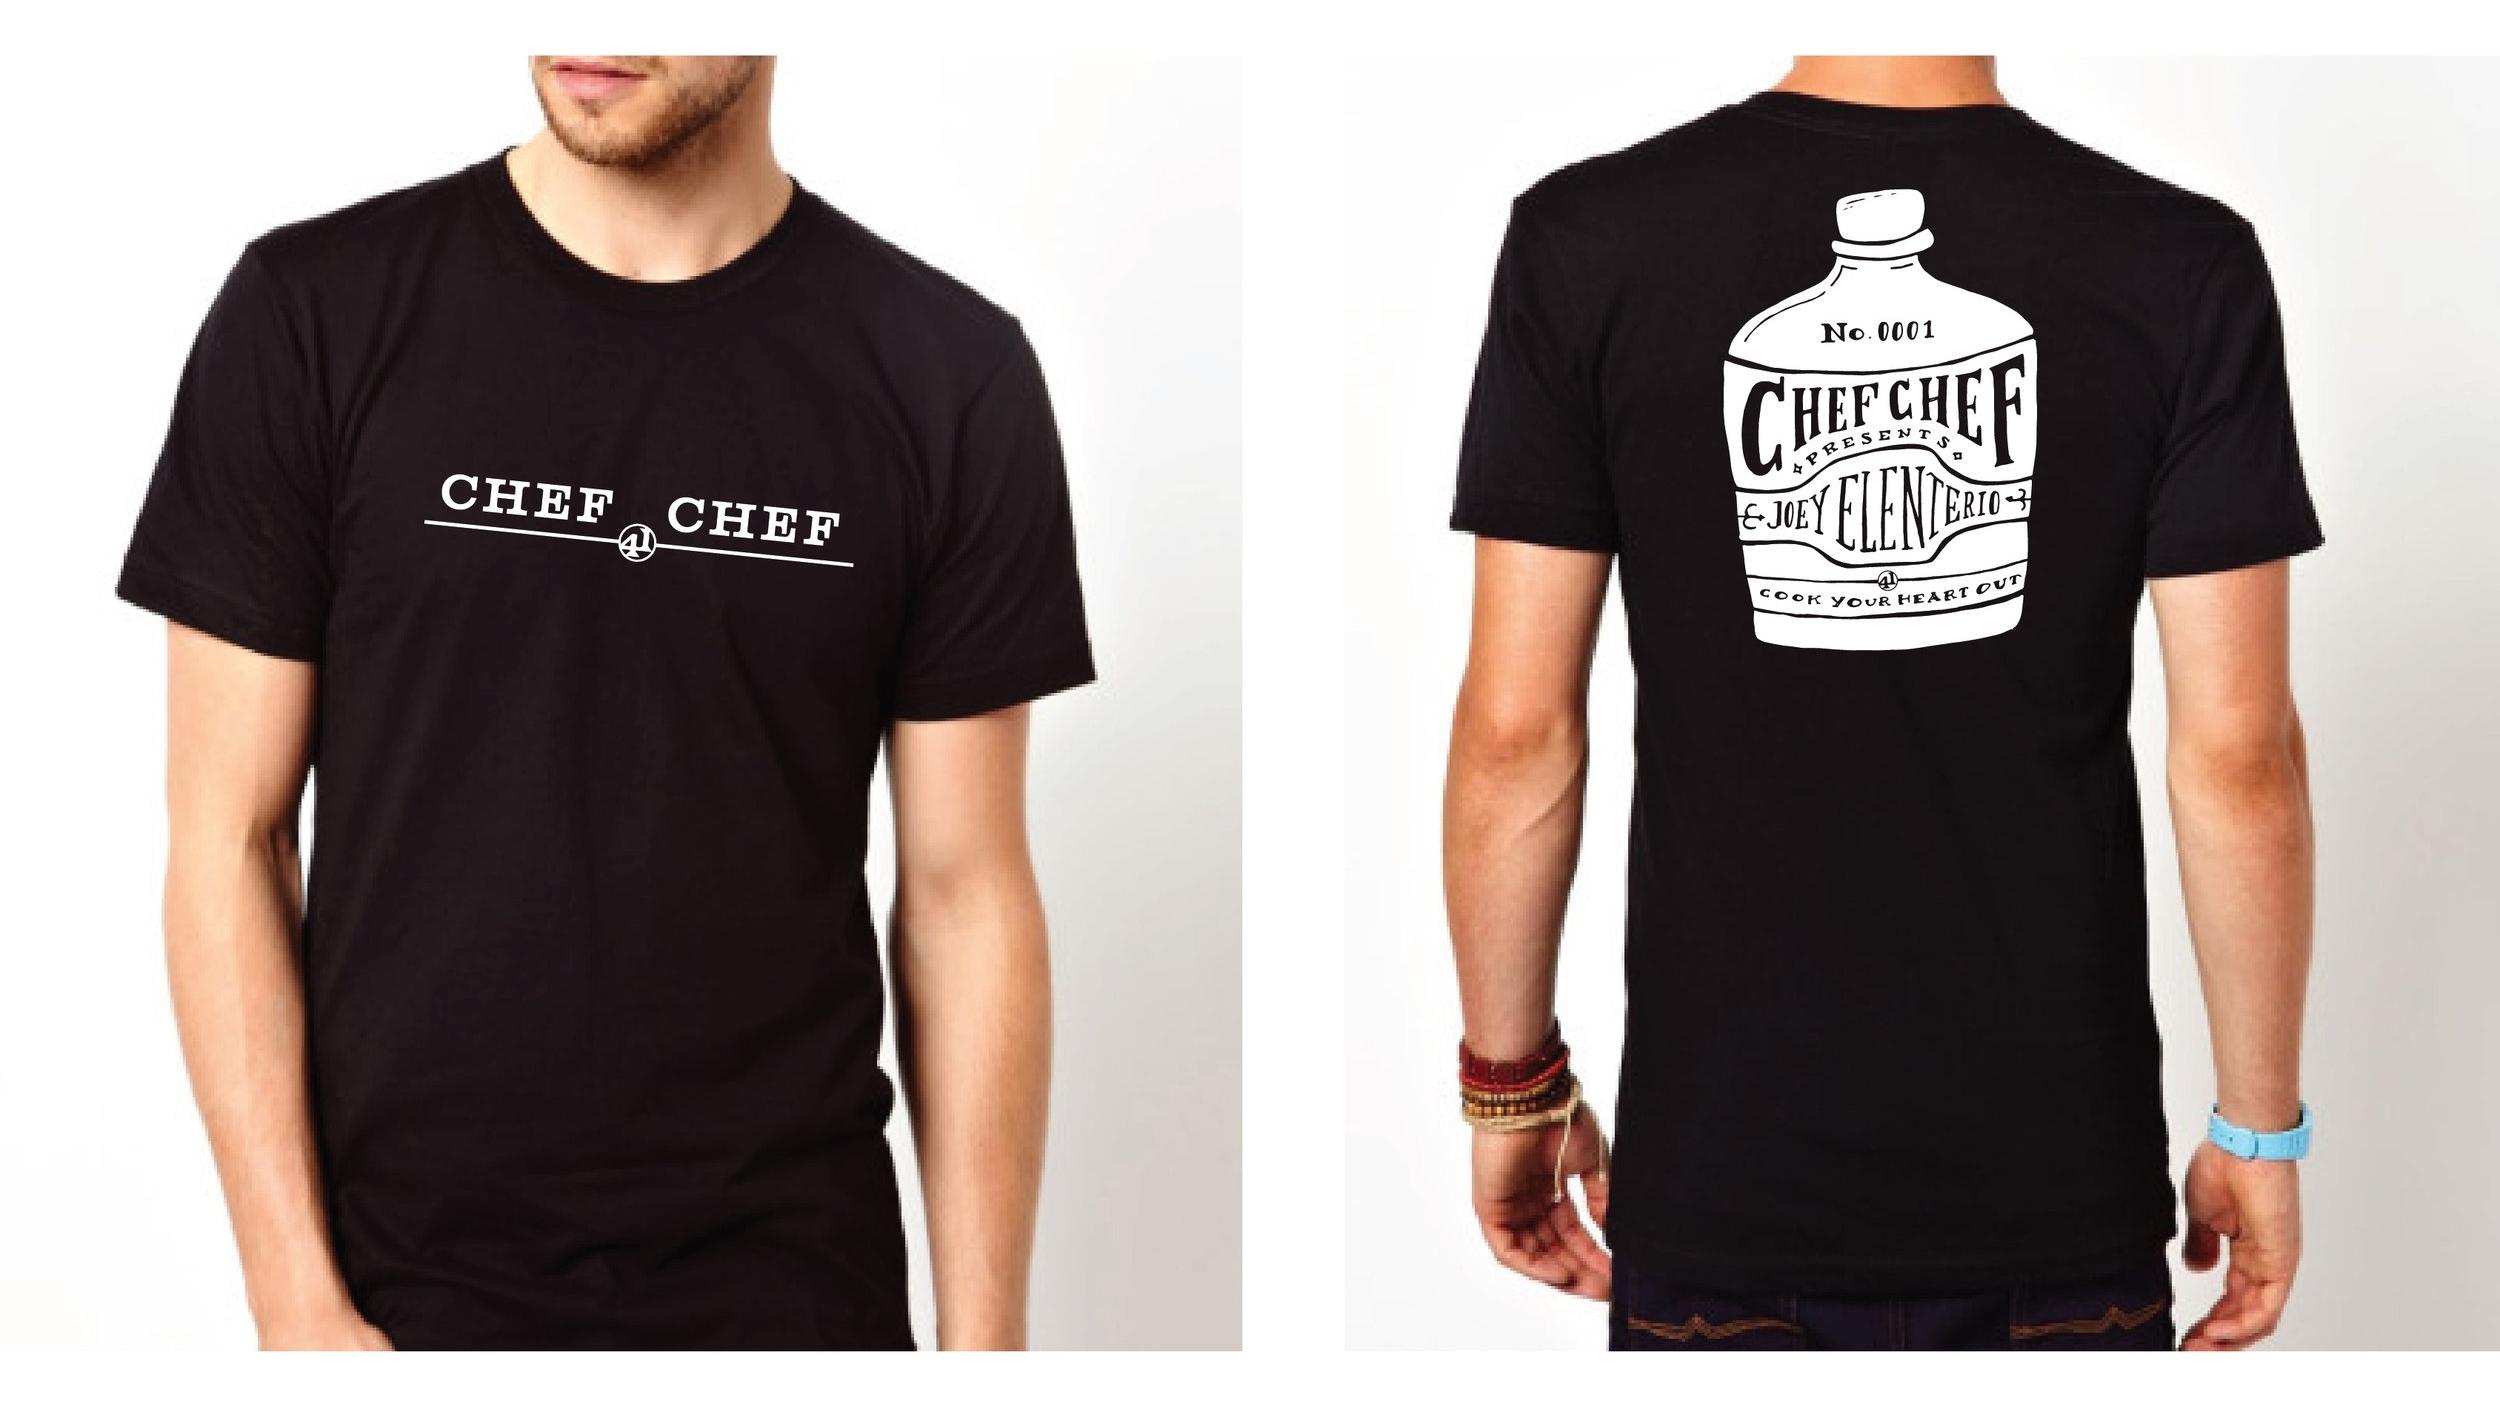 CHEF CHEF No. 0001_Joey shirt deisgn-03.jpg